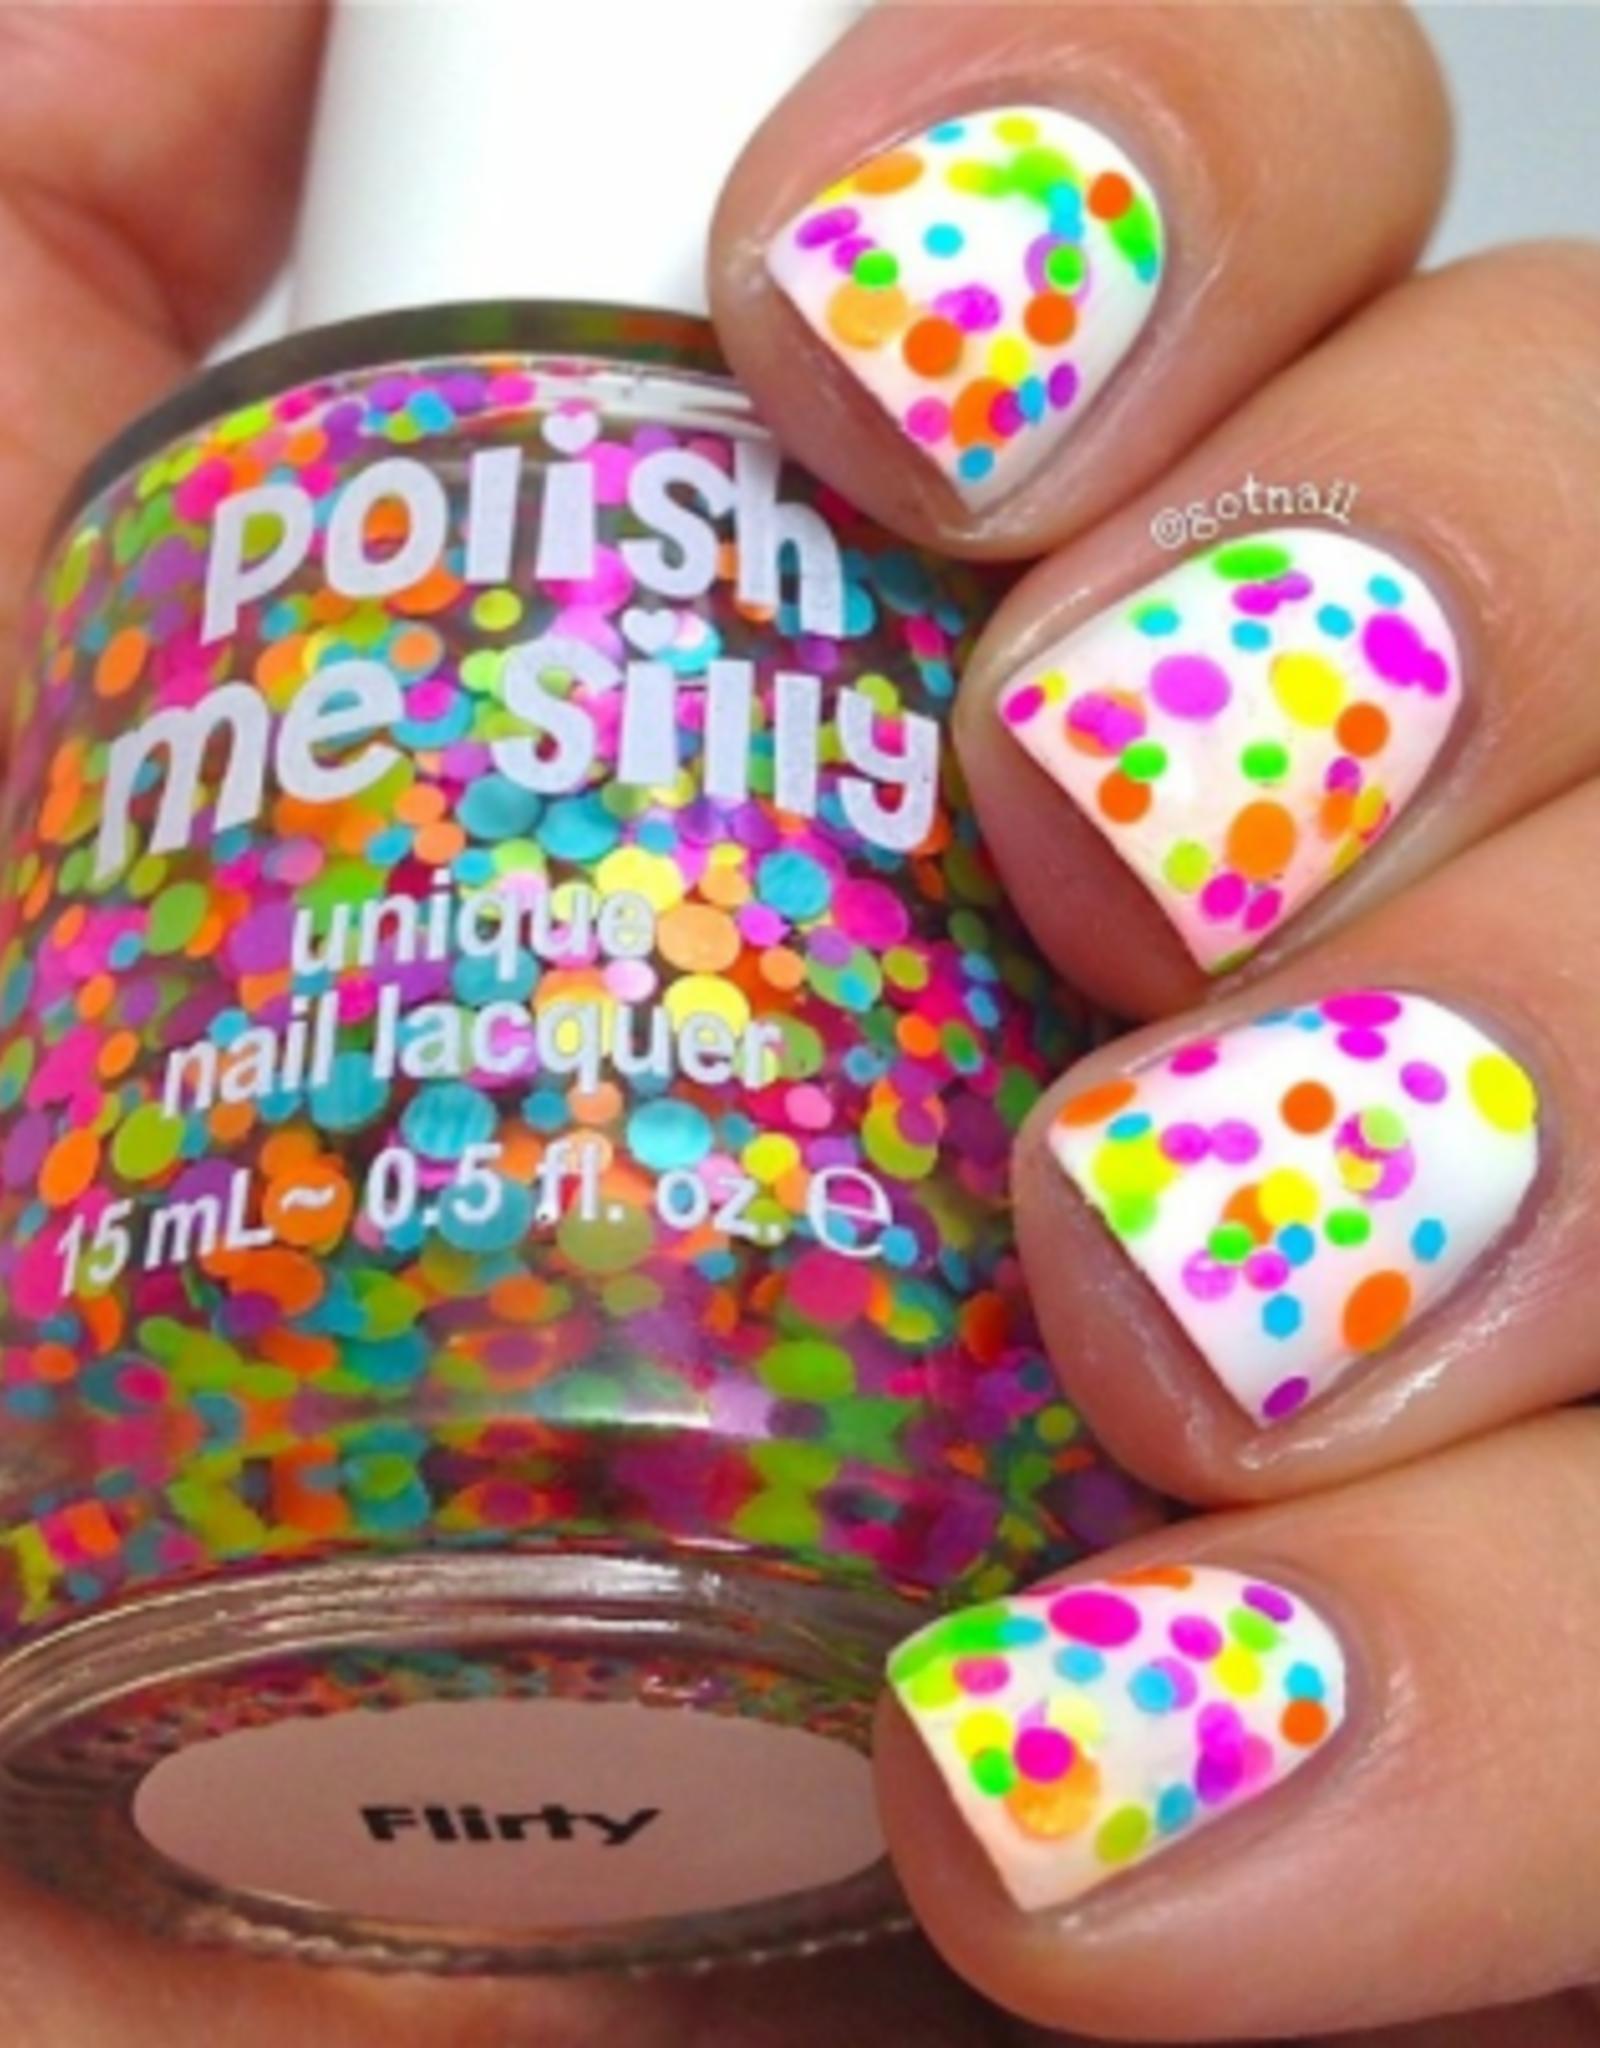 Polish Me Silly Glitter Flirty